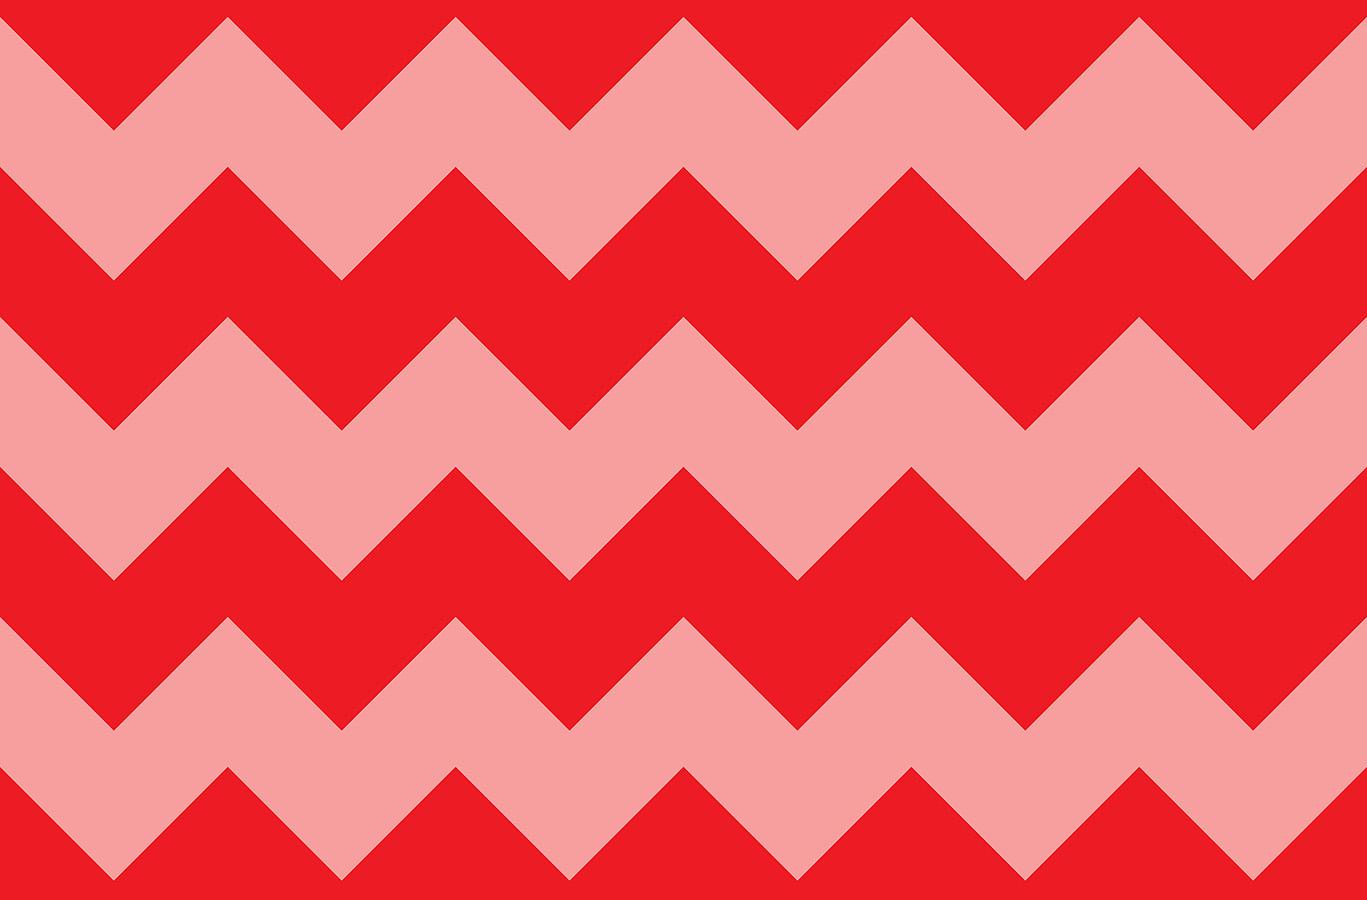 vf203re1_chevron_stripe_red